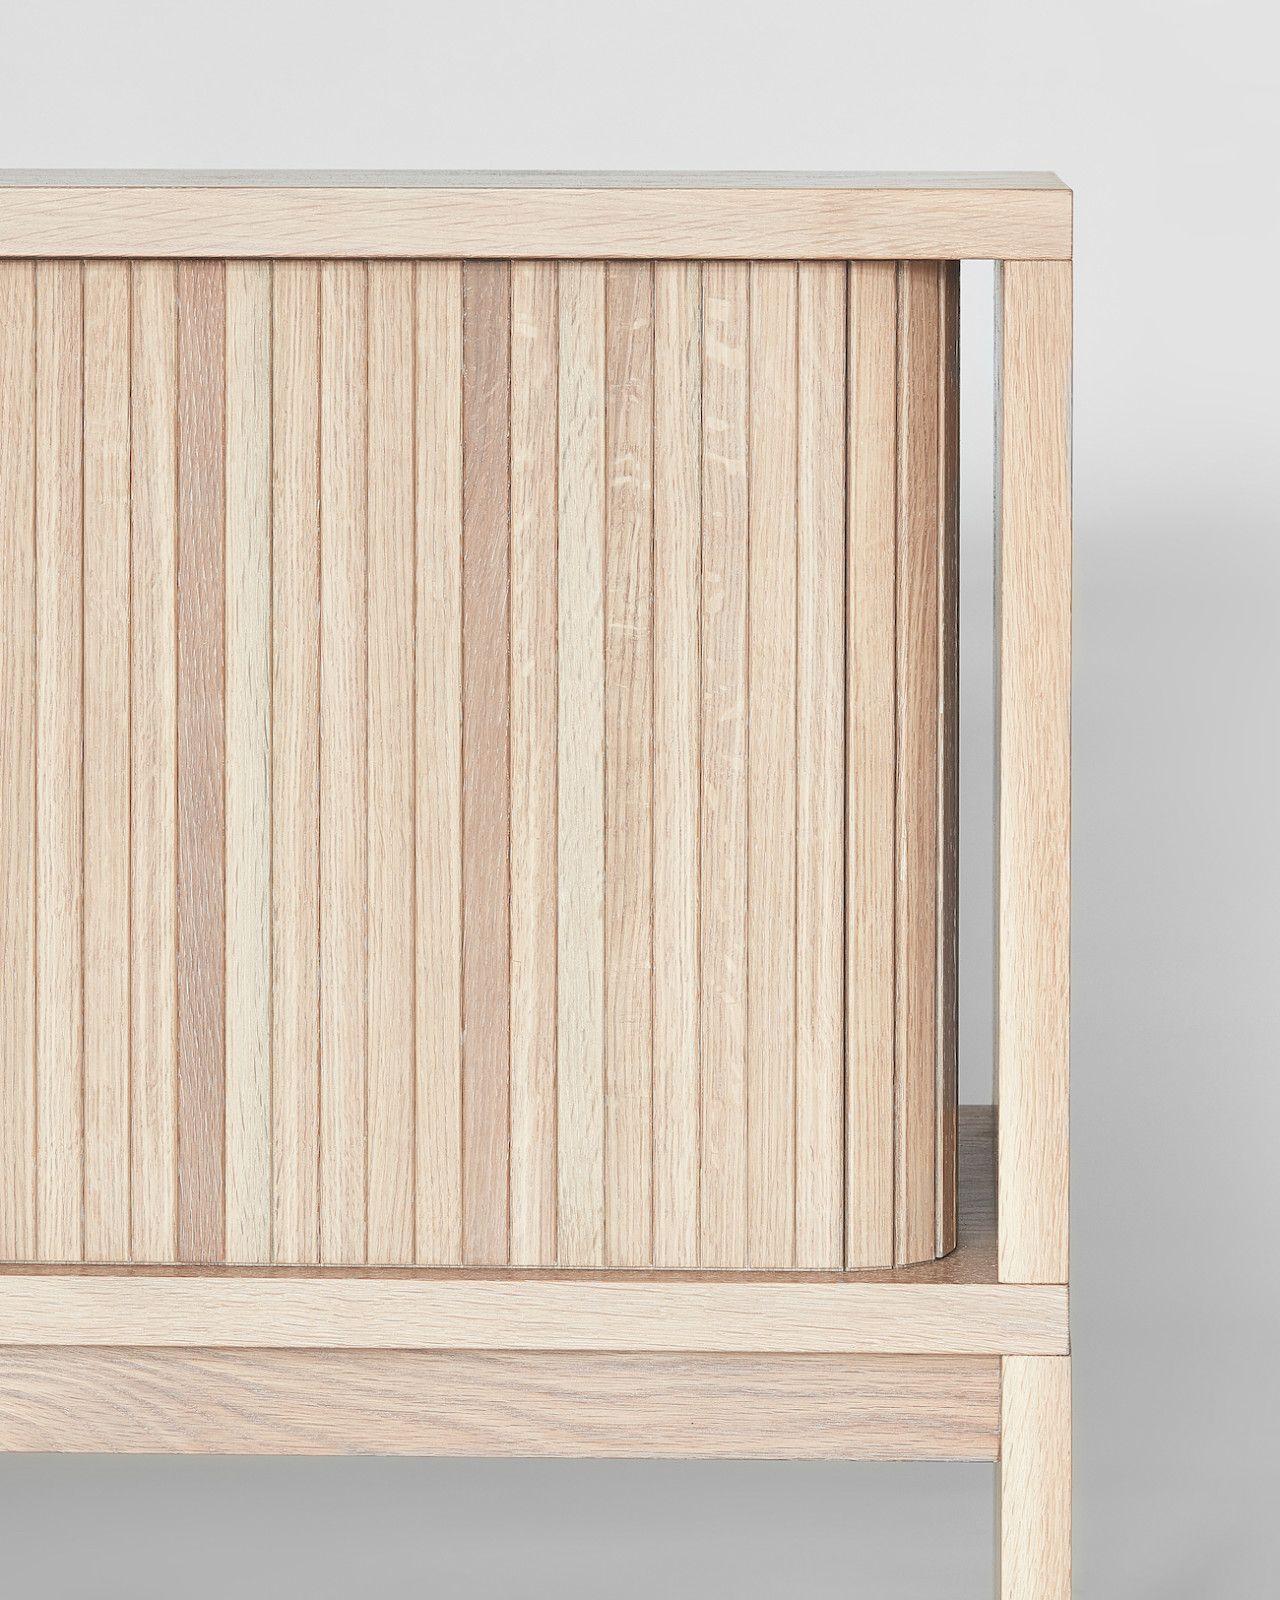 The Minimalist Mjolk Tambour Cabinet by Thom Fougere - Design Milk